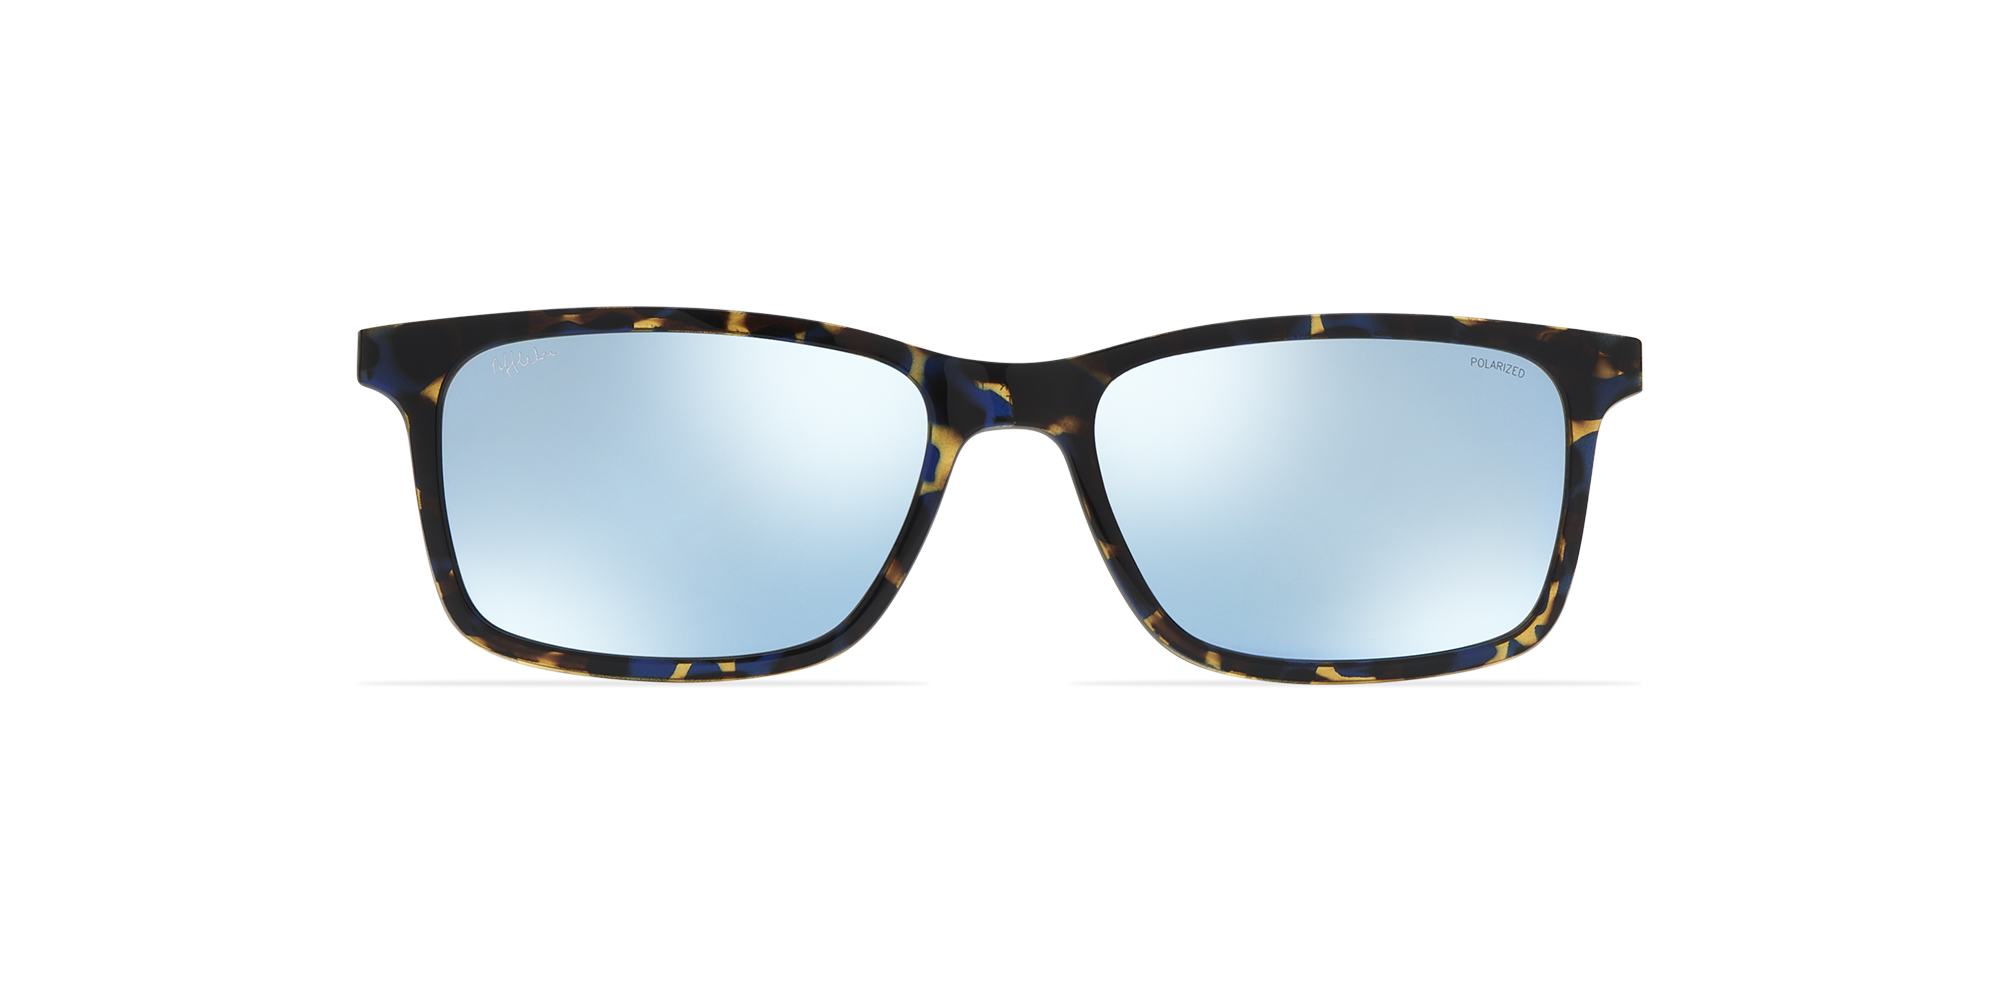 afflelou/france/products/smart_clip/clips_glasses/TMK32PRTO025316.png